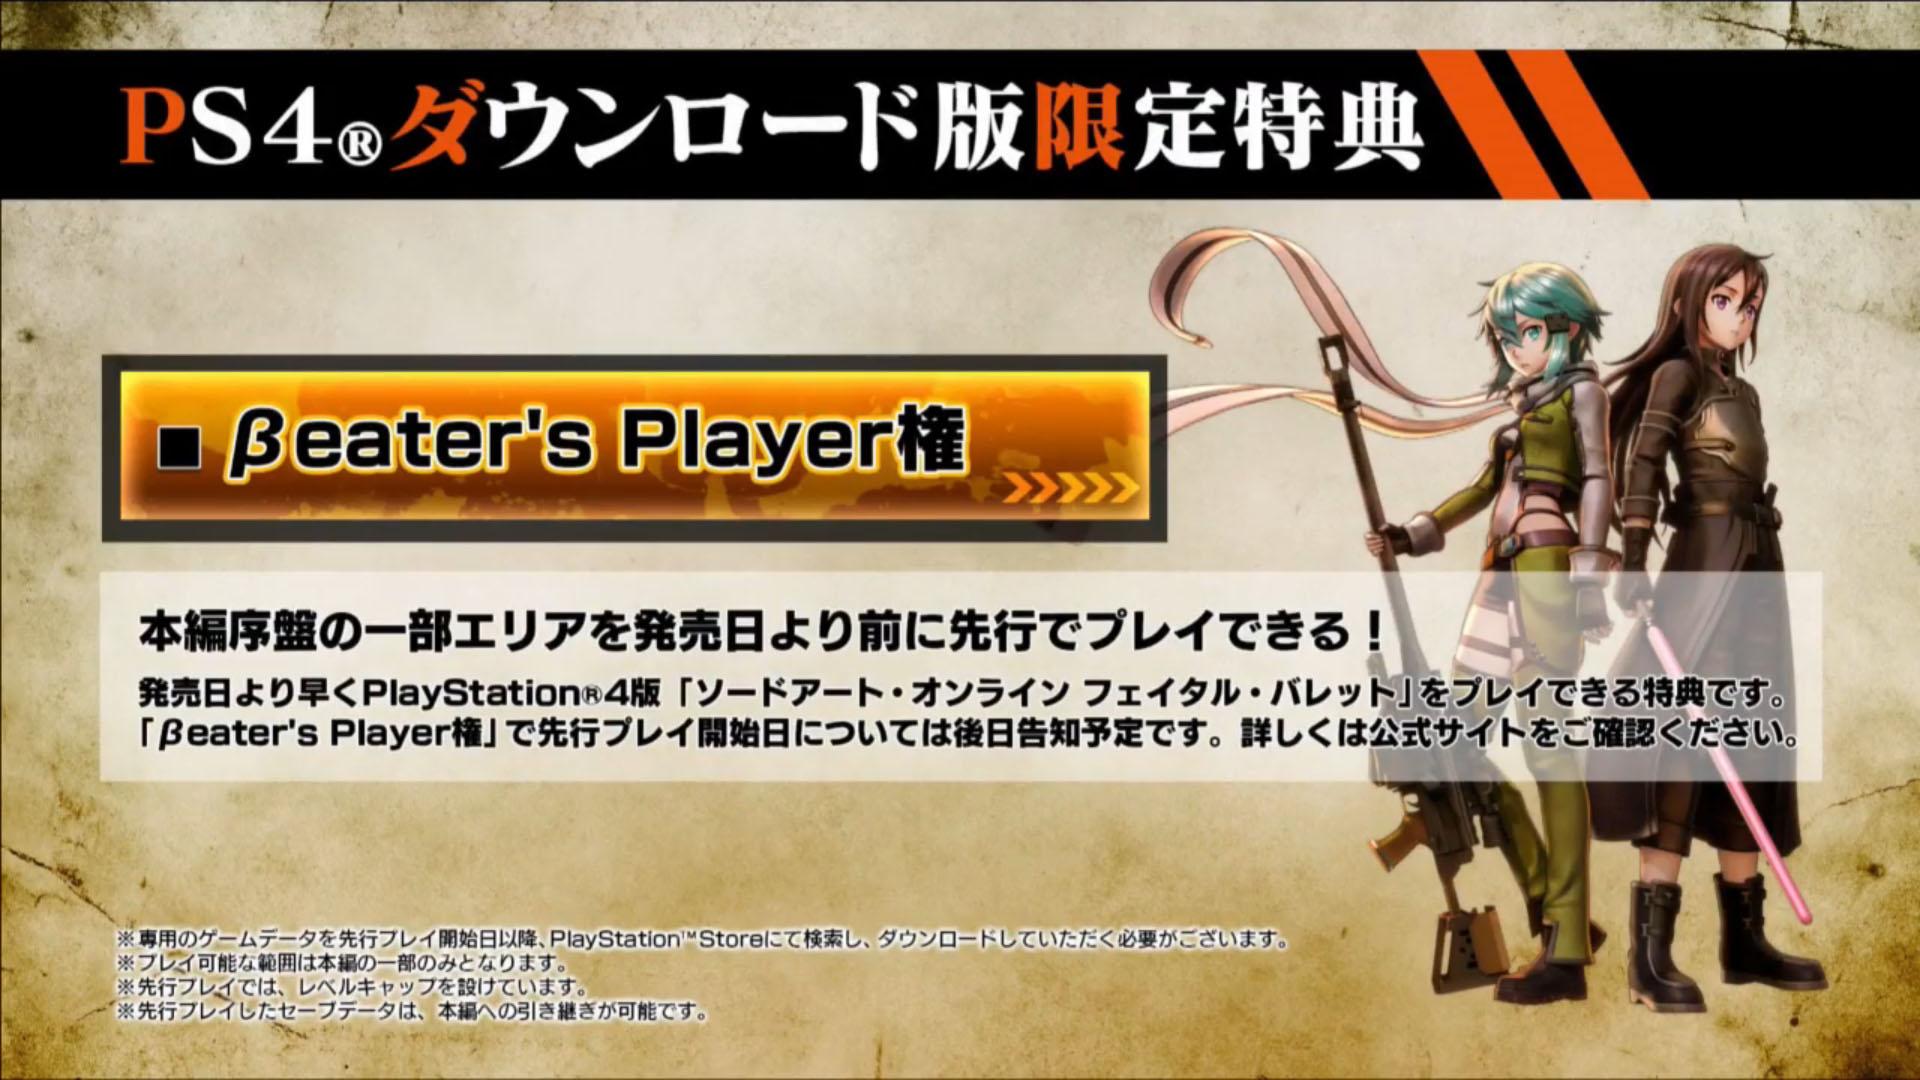 Sword Art Online: Fatal Bullet launches February 8 in Japan